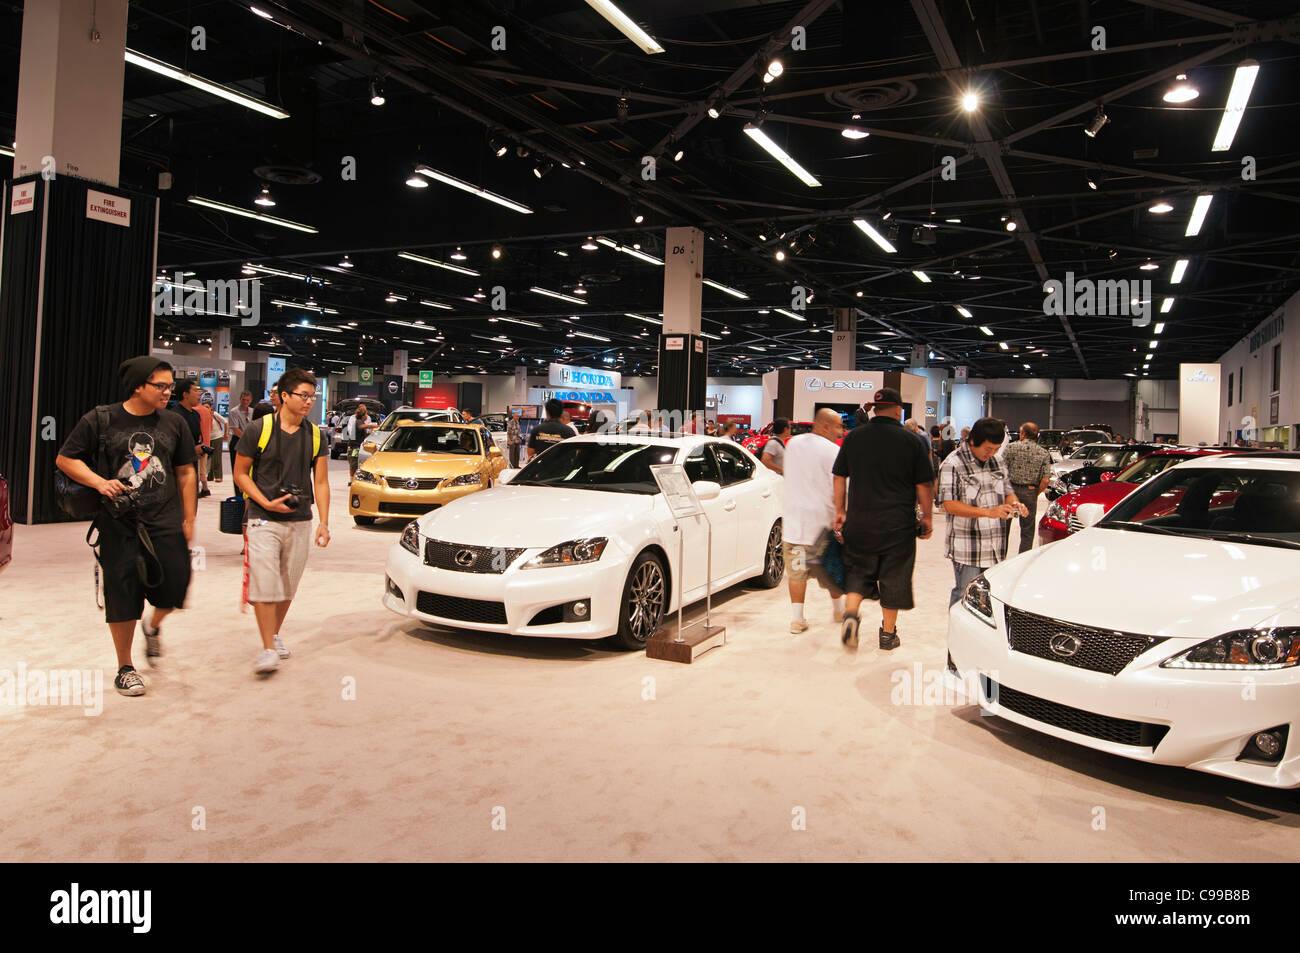 Orange County Auto Show >> The Orange County International Auto Show Stock Photo 40159067 Alamy